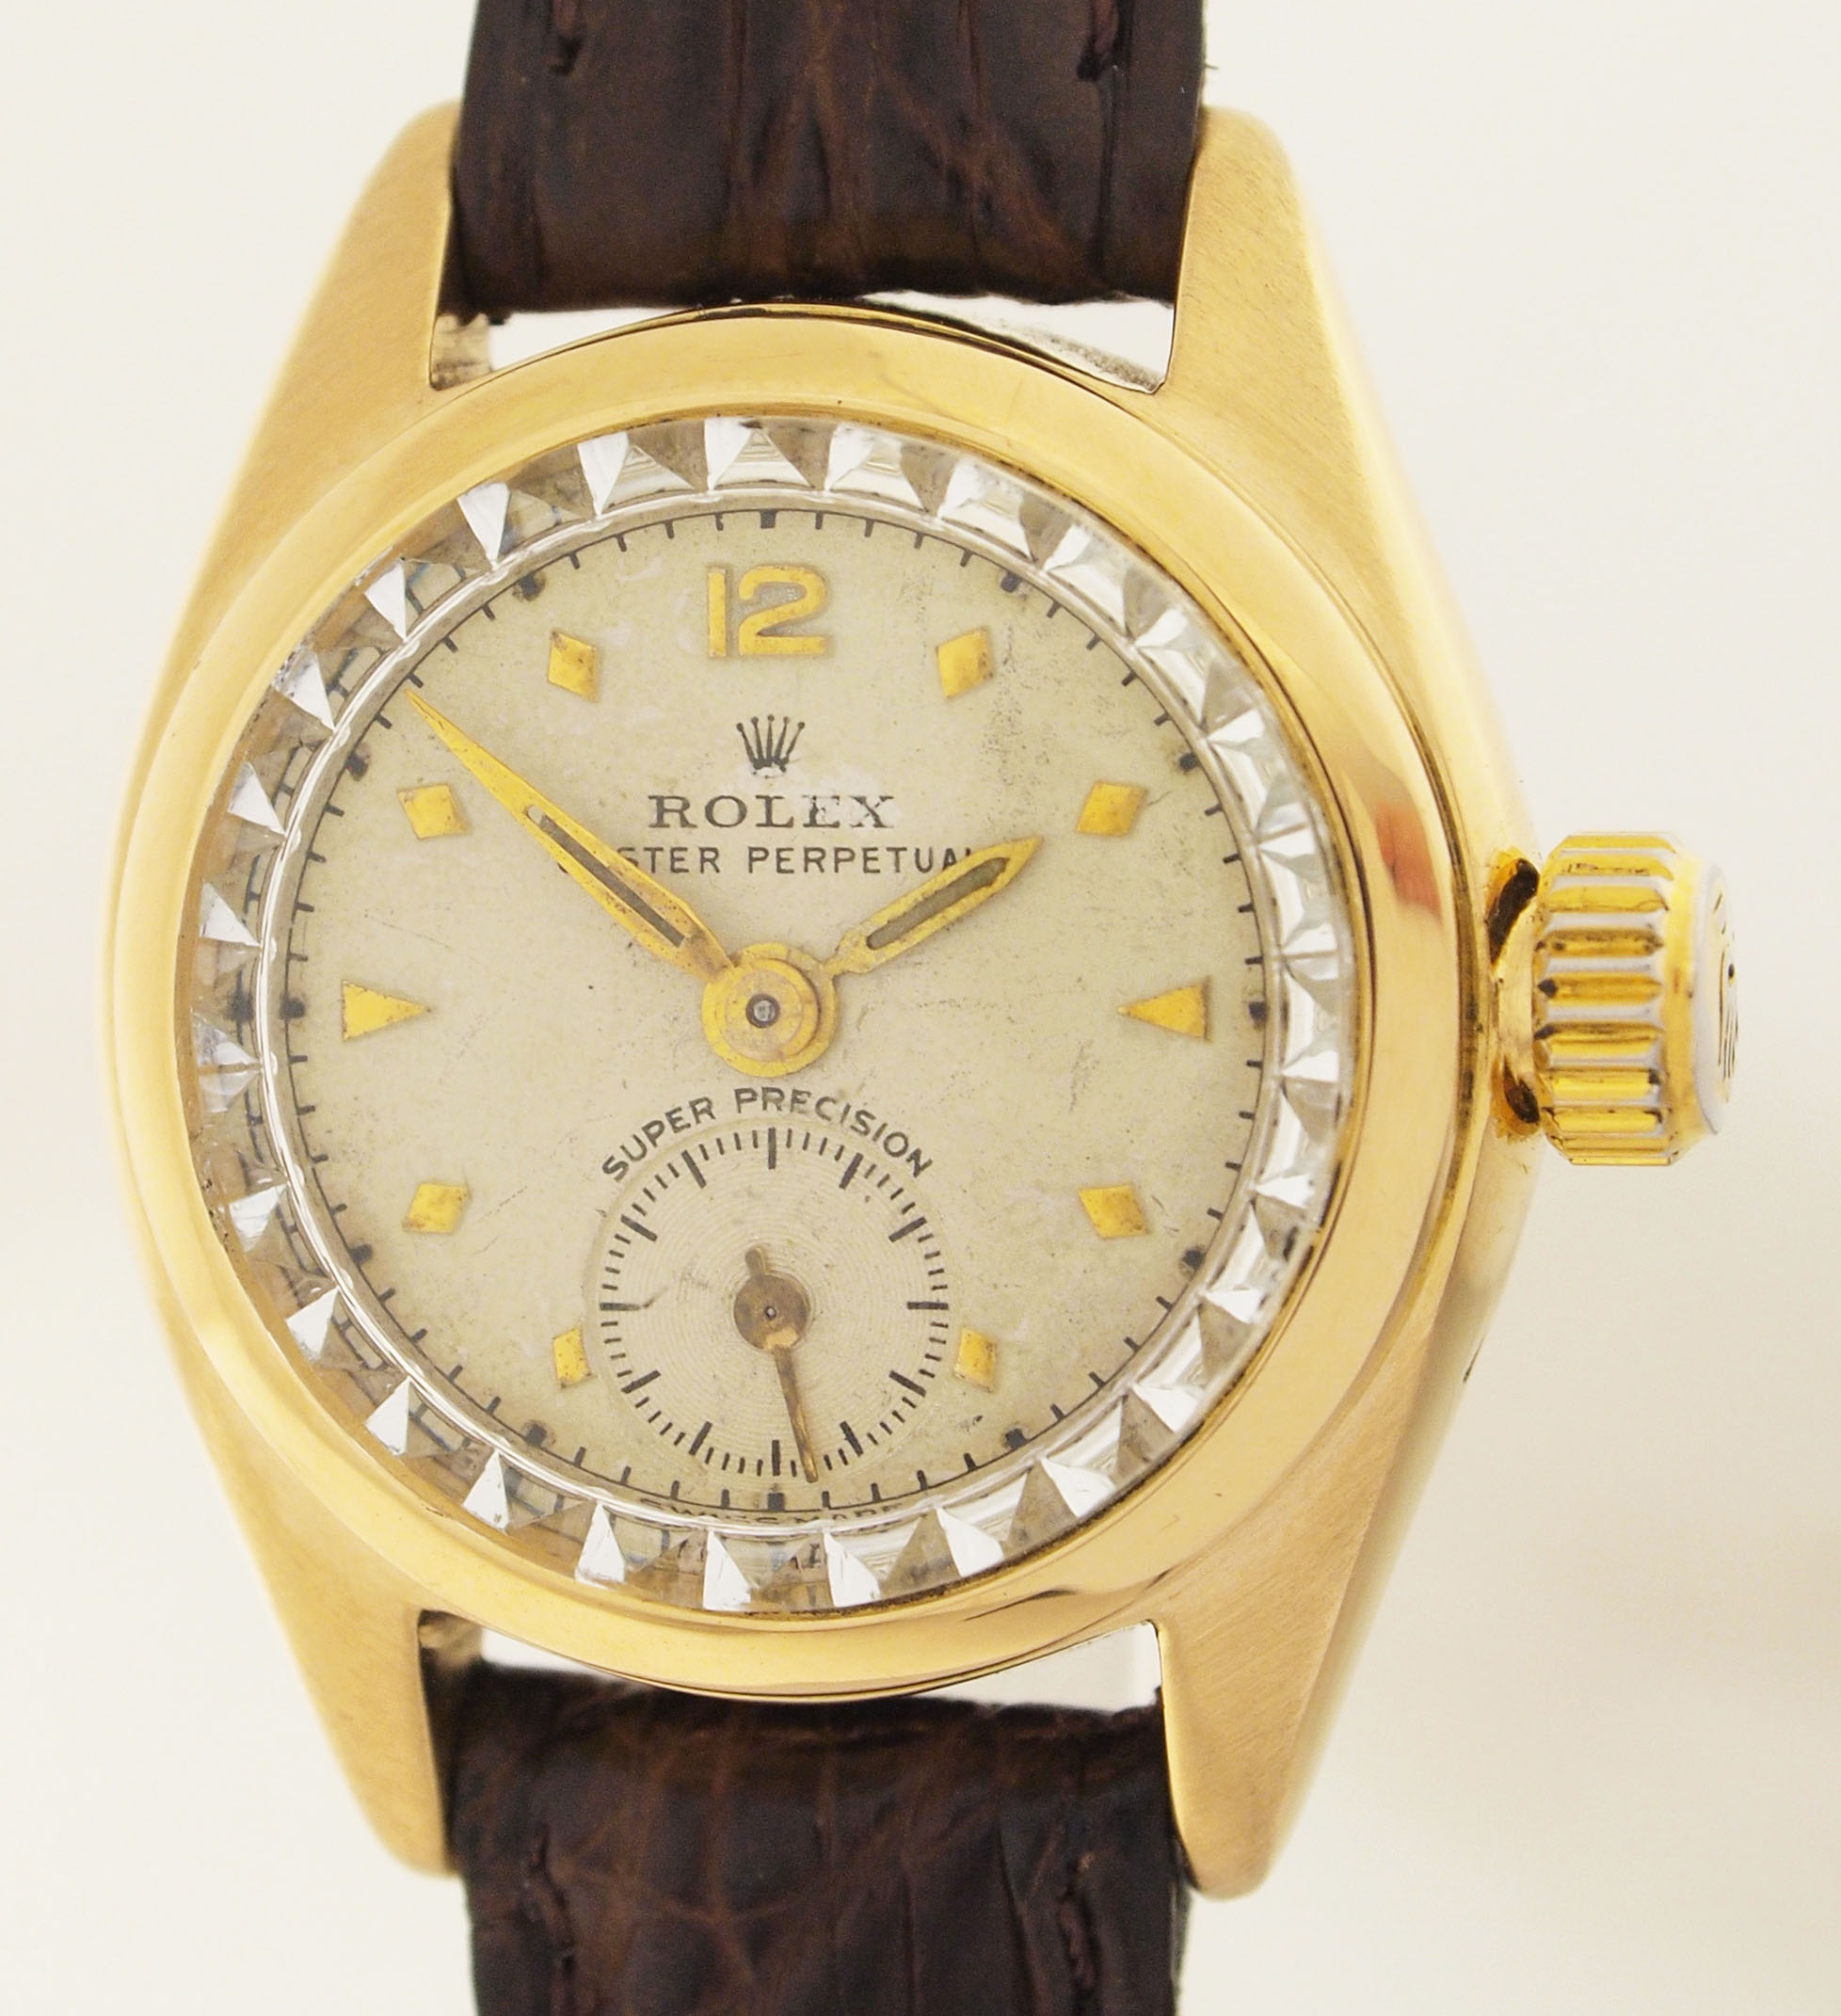 rolex bubbleback ladies wristwatch in 18ct gold ref 4486 rare 1950er years ebay. Black Bedroom Furniture Sets. Home Design Ideas